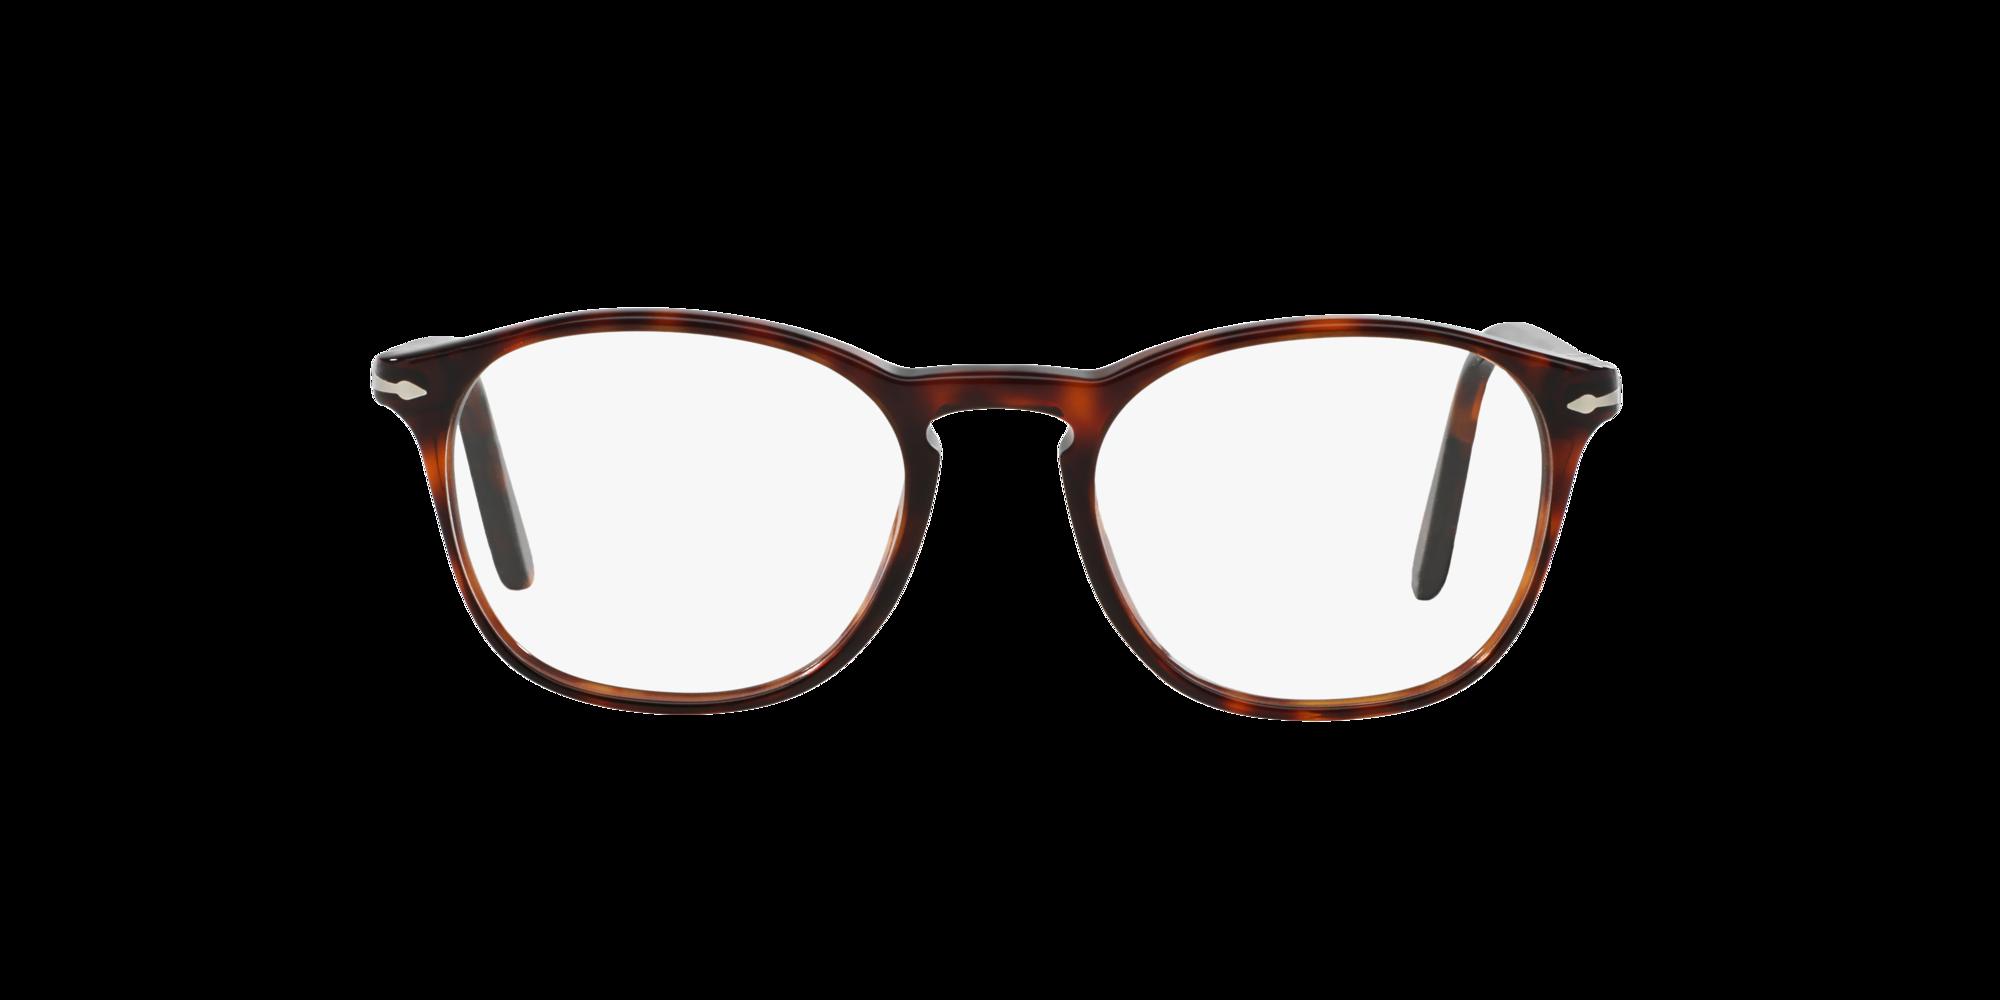 Image for PO3007V from LensCrafters | Glasses, Prescription Glasses Online, Eyewear